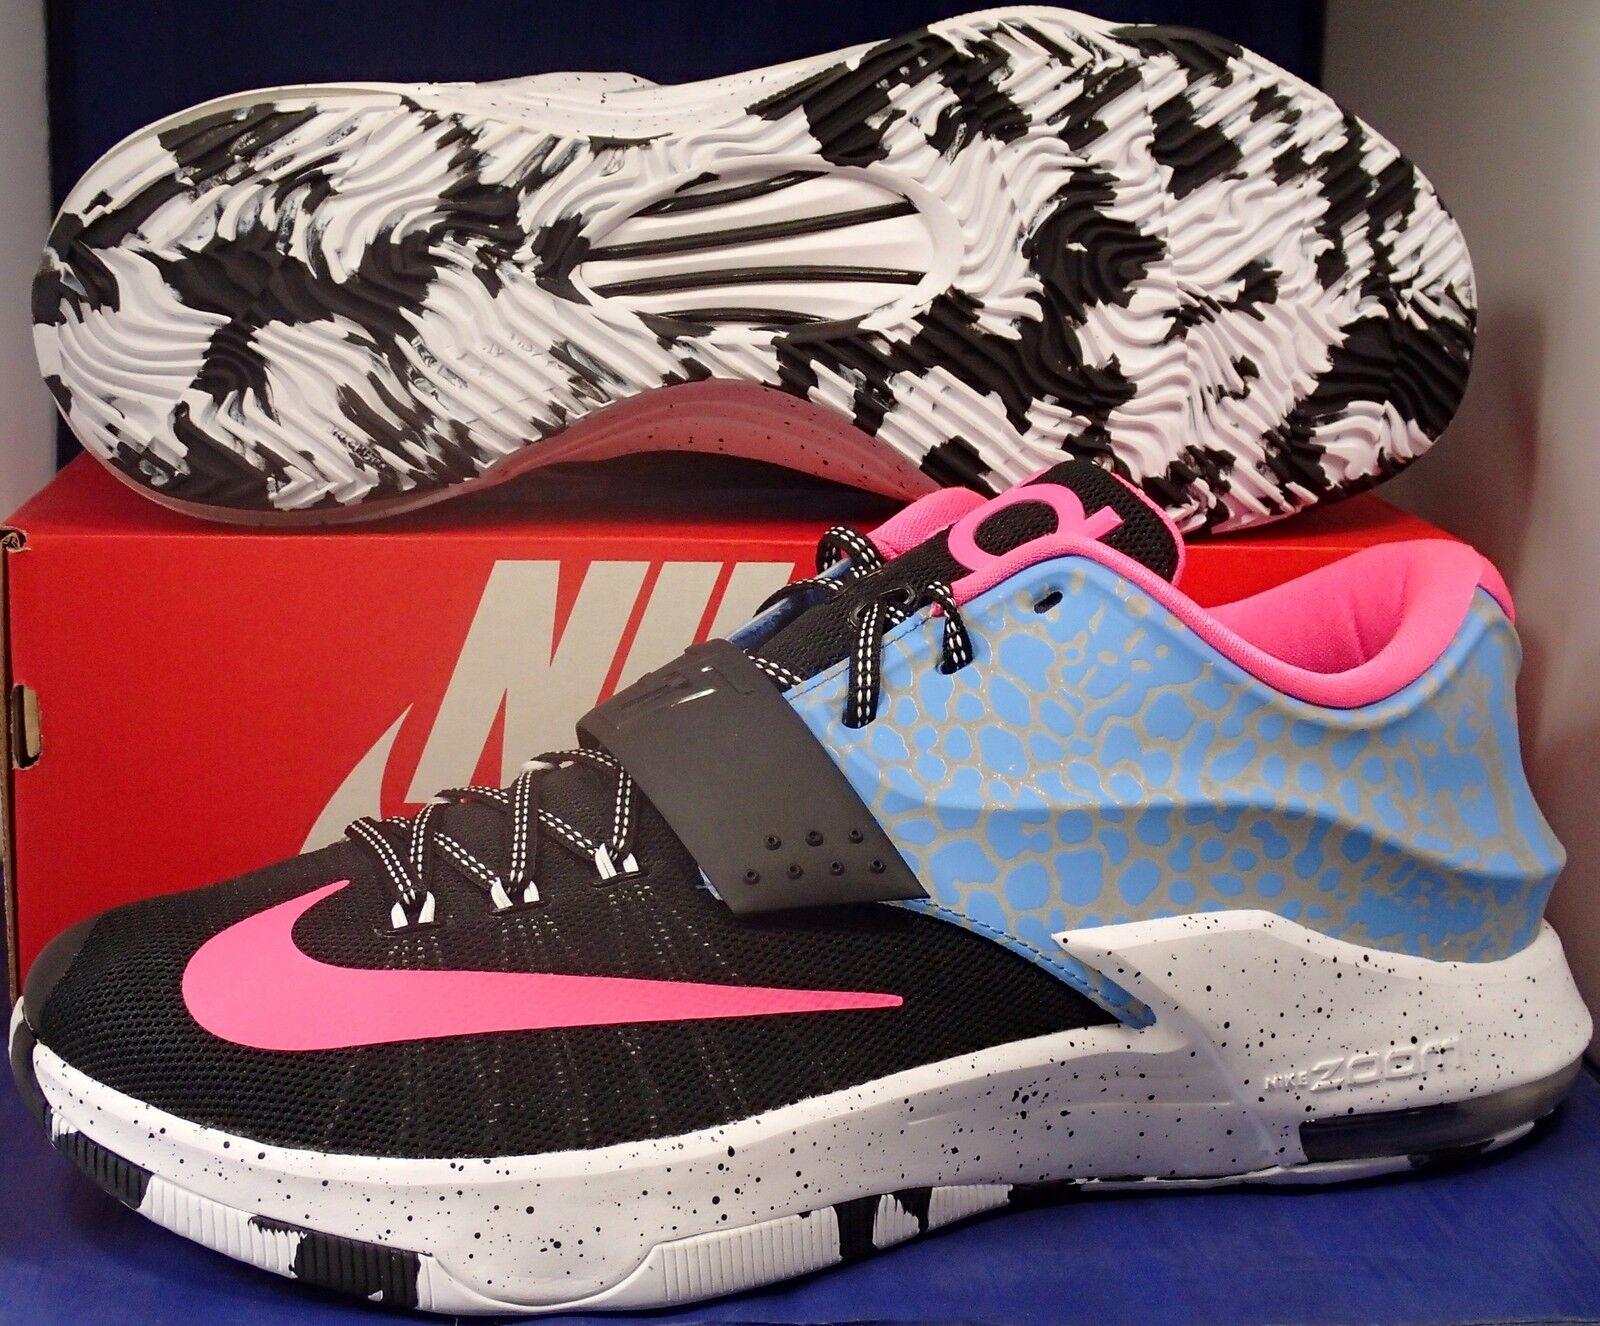 Nike KD VII 7 iD Black bluee Pink White Kevin Durant SZ 13.5 ( 704380-982 )